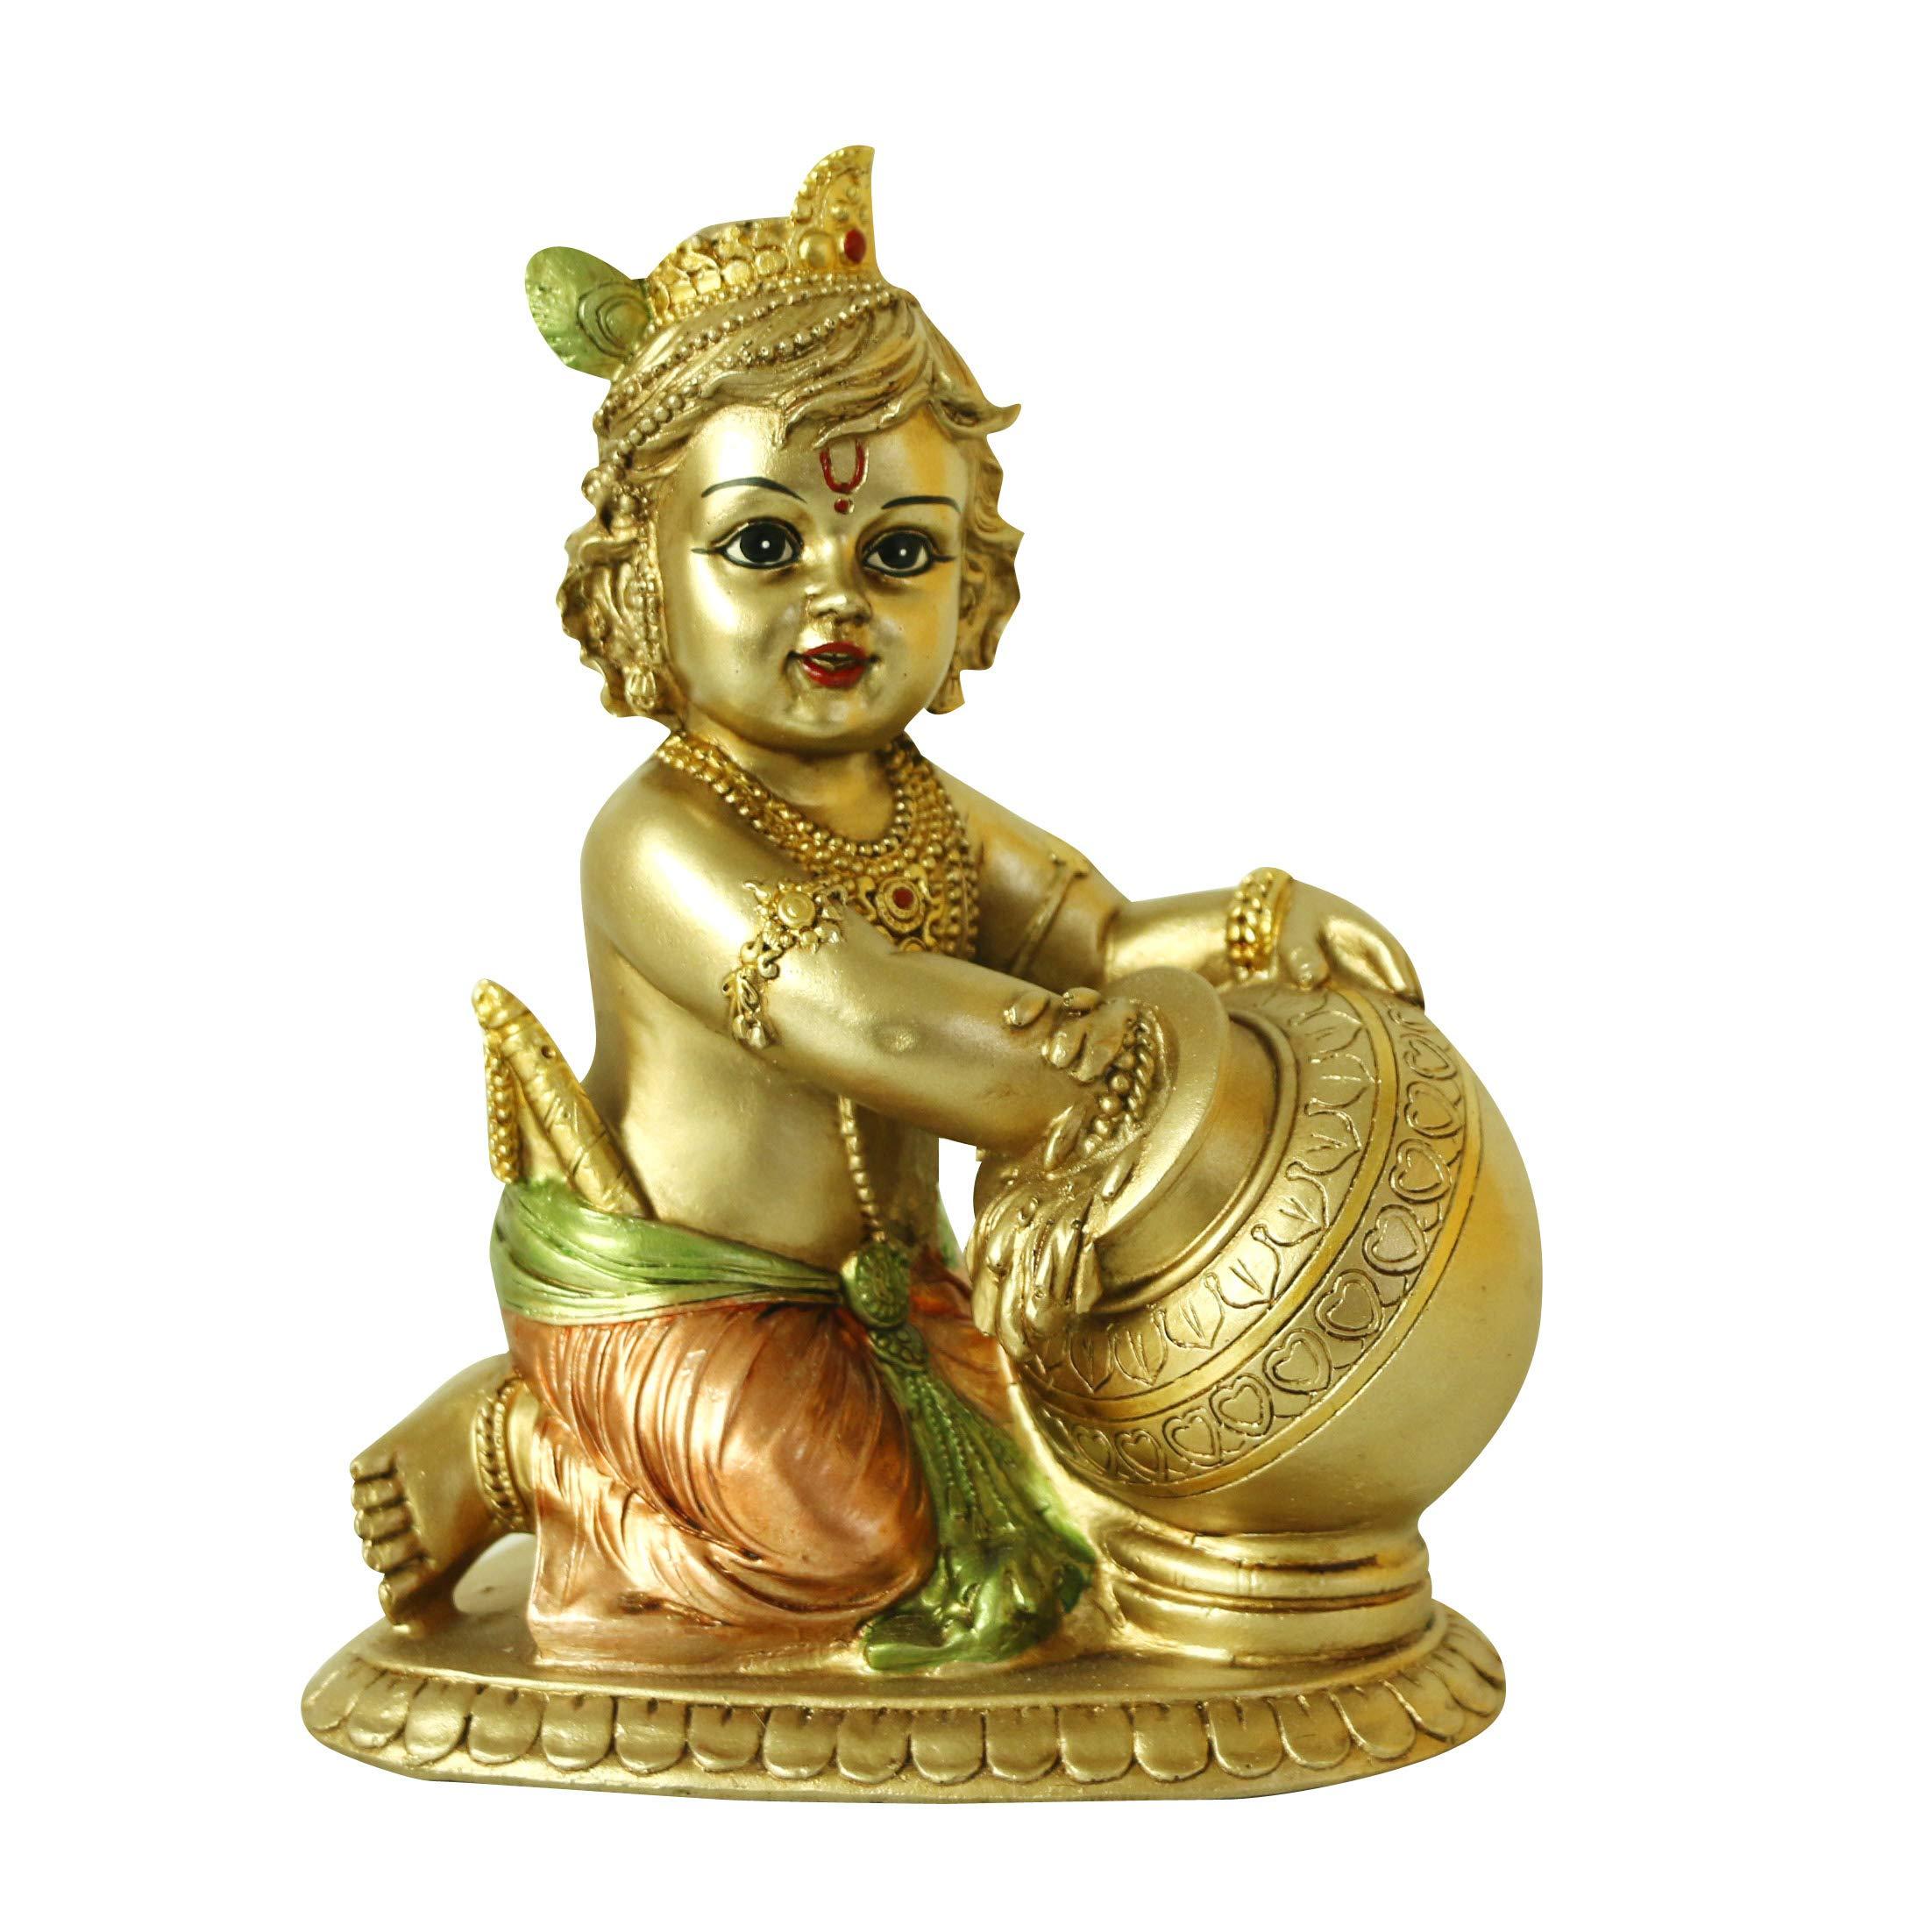 Hindu Lord Baby Krishna Statue – Indian Idol Krishna Figurines for Home Mandir Temple Pooja - India Murti Buddha Sculpture Religious Gifts Items